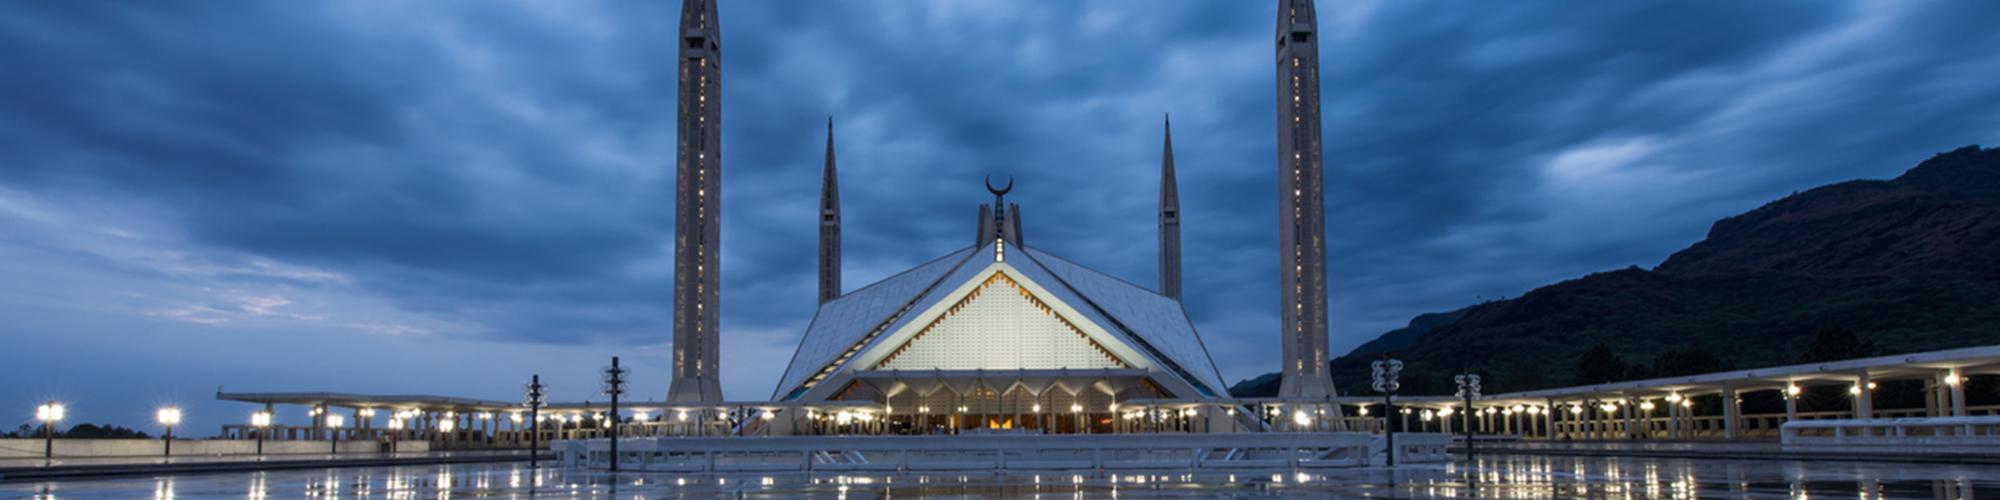 Silk road to Pakistán - El País Viajes